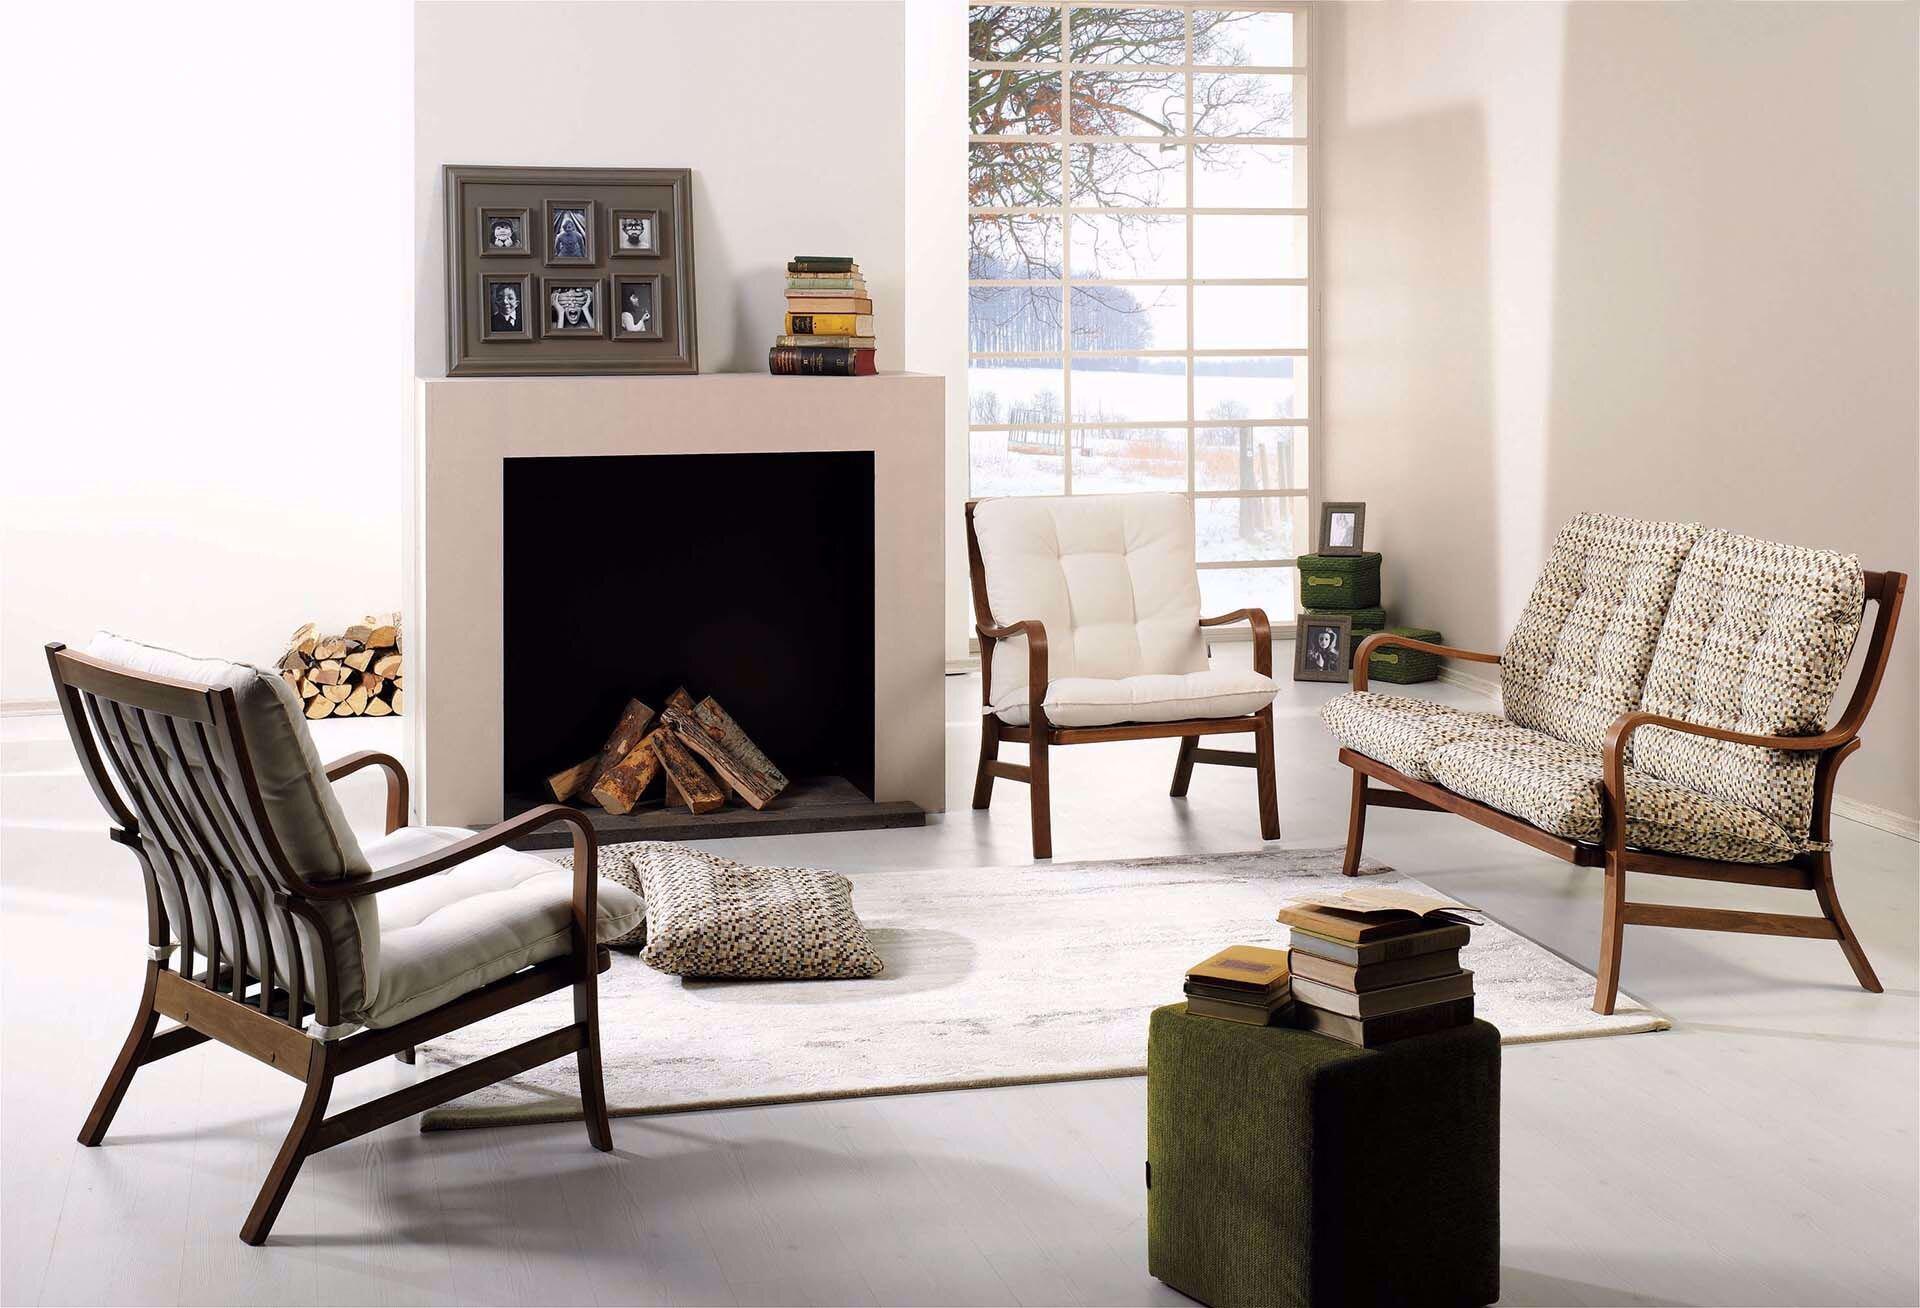 Ikarus Two-Seat Sofa